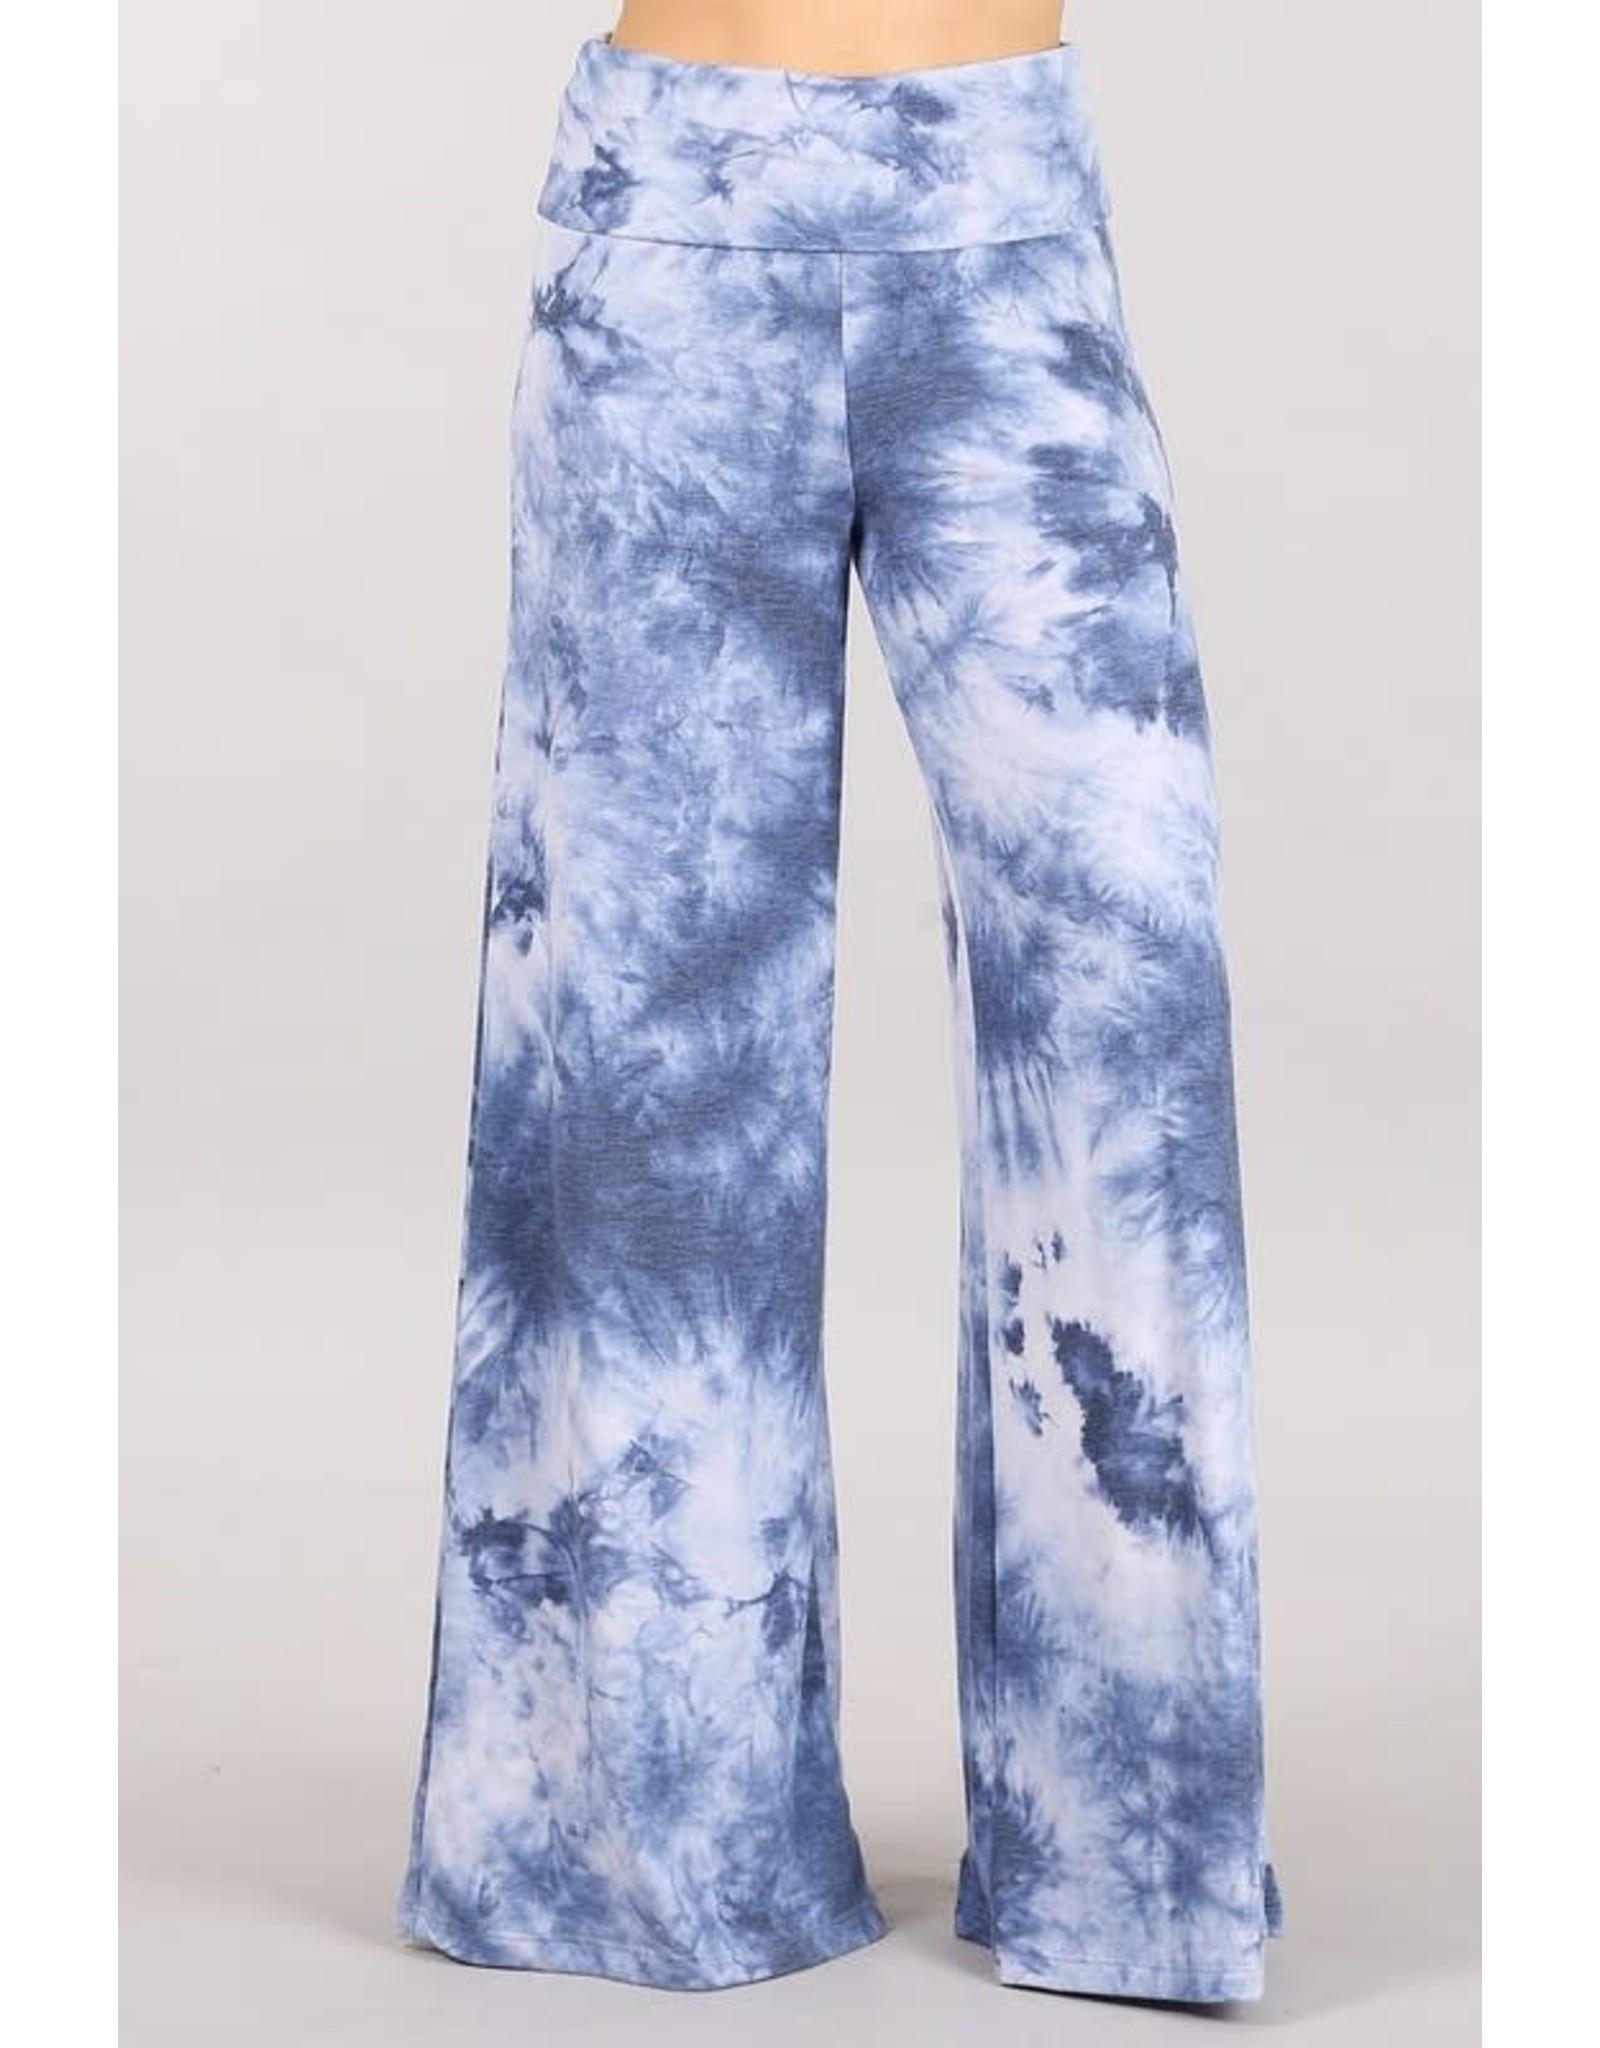 Blue Tie-Dye Palazzos